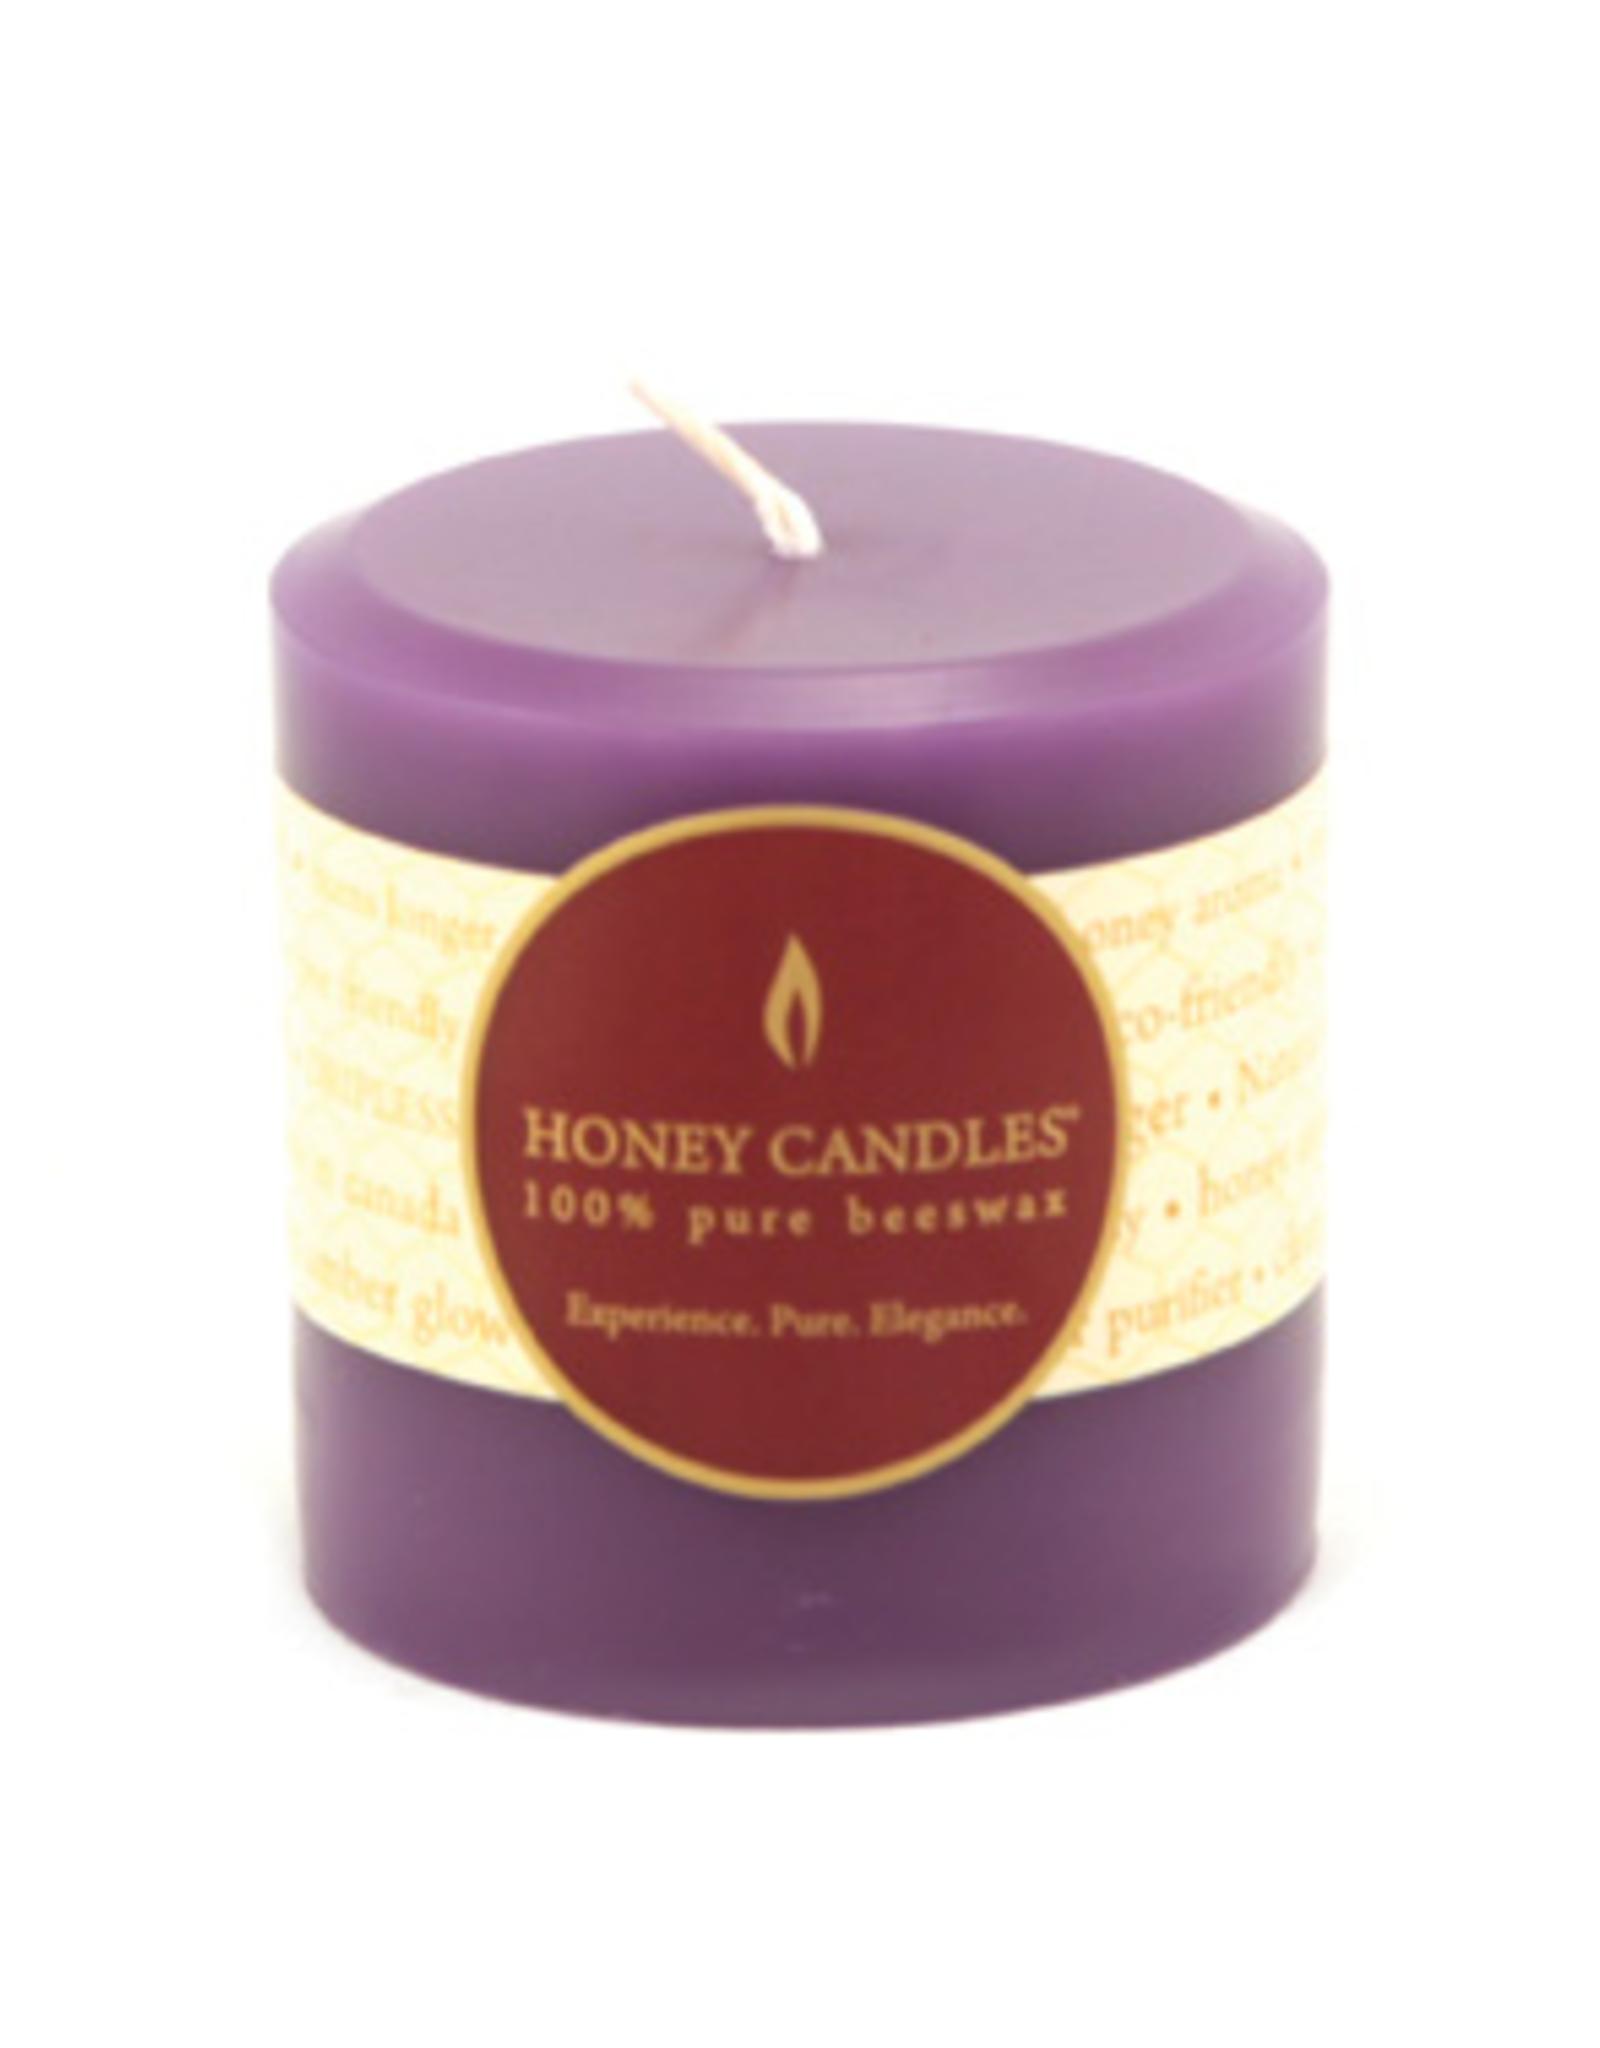 "Honey Candles Honey Candles 3"" Round Pillar-Spring Crocus"